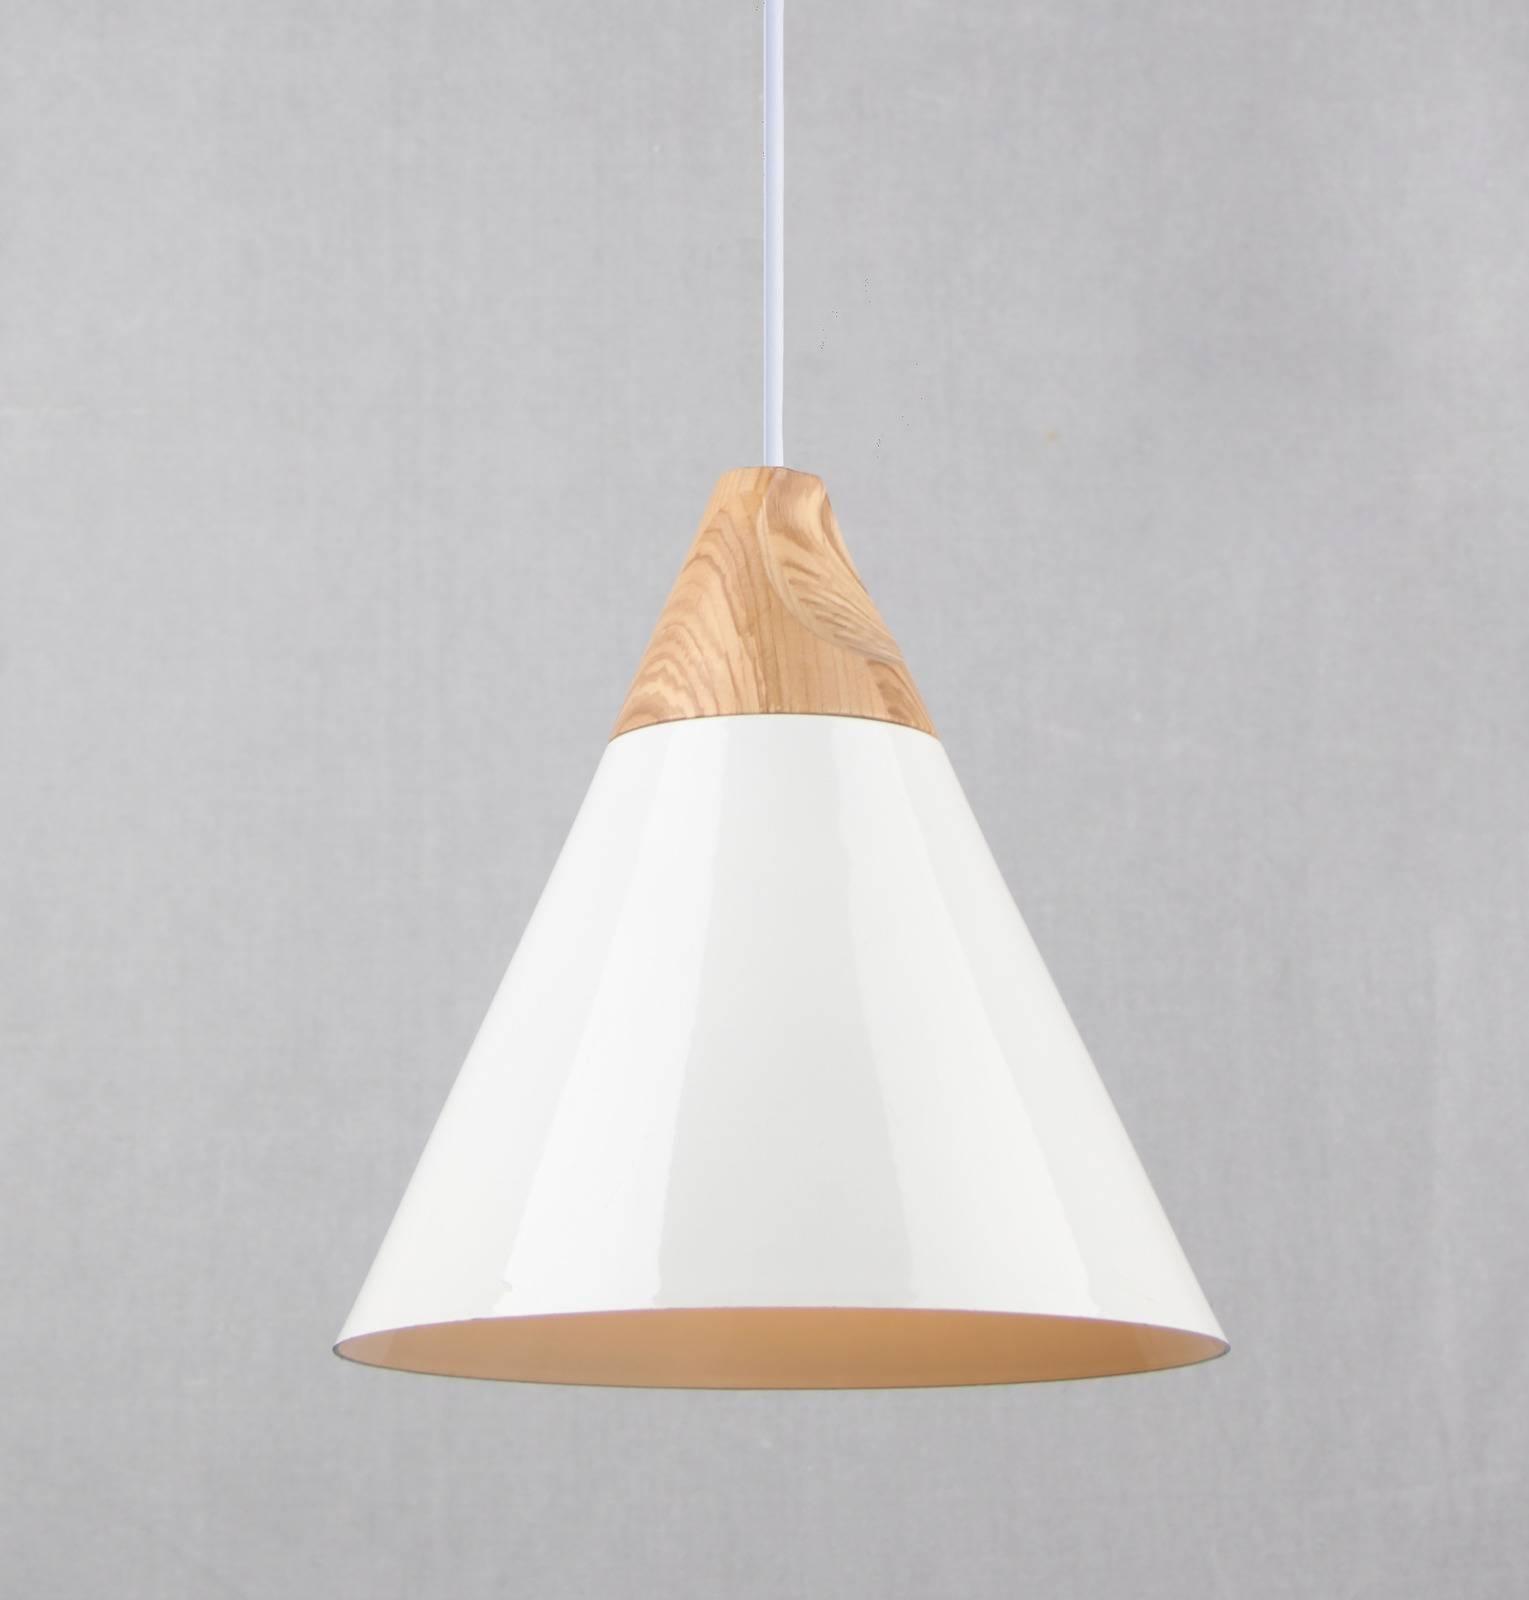 Elias White Metal/wooden Pendant Light – Hampton & Harlow Intended For Wooden Pendant Lighting (View 15 of 15)